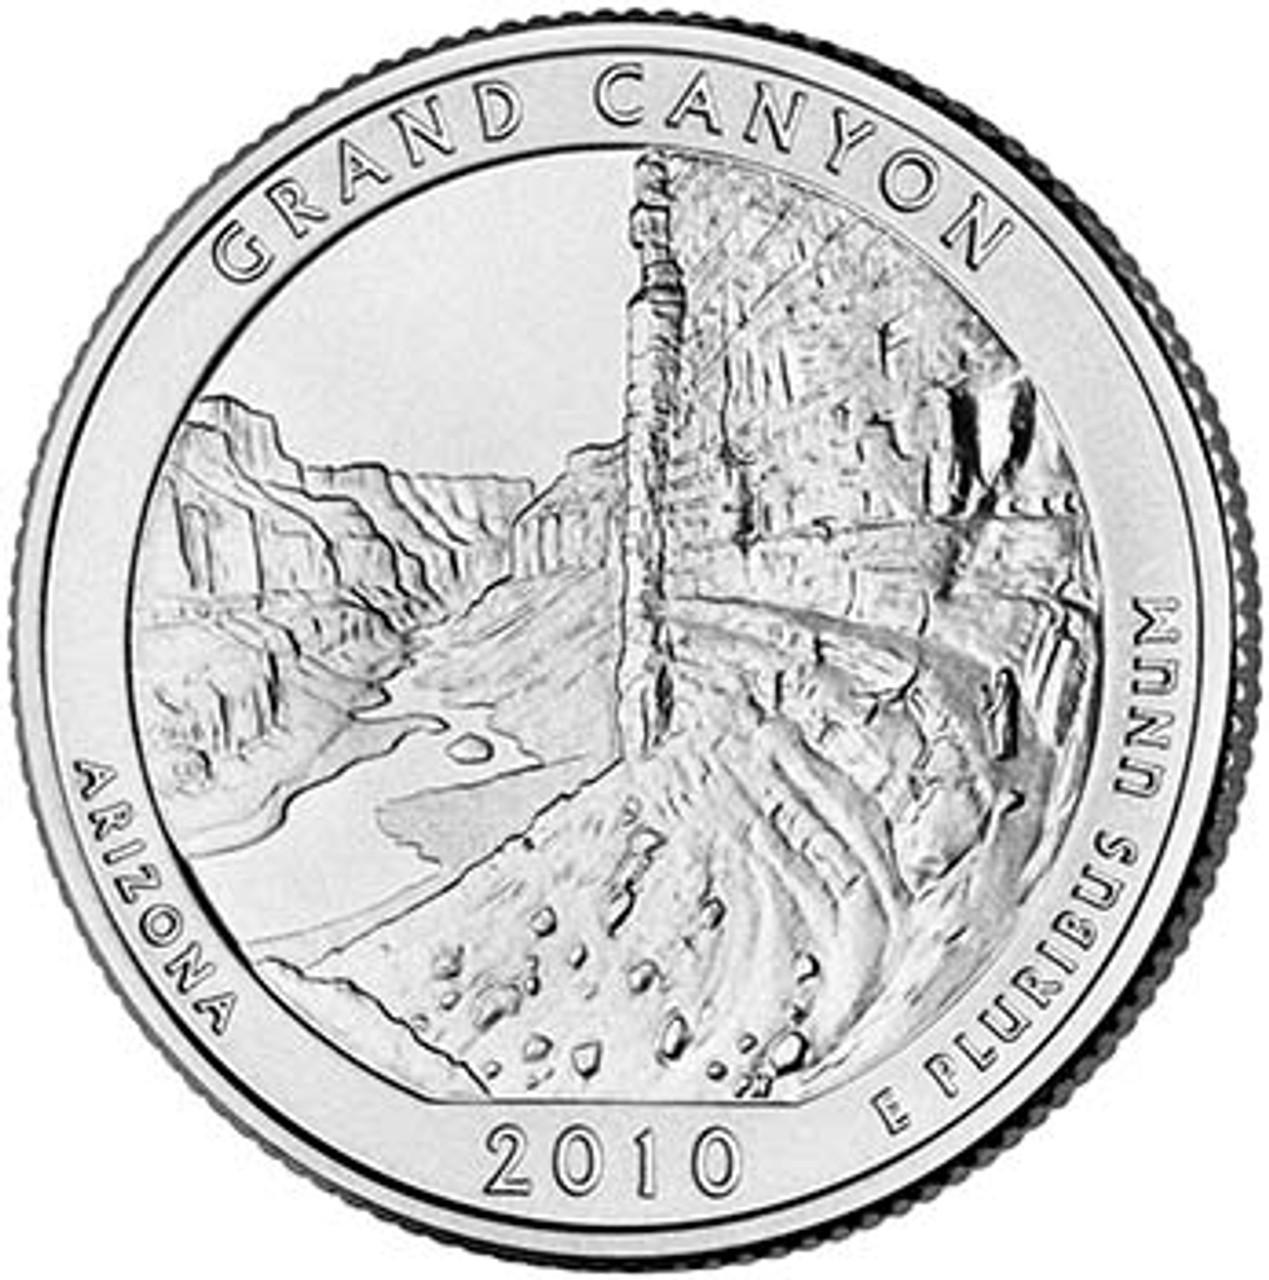 2010-P Grand Canyon National Park Quarter Brilliant Uncirculated Image 1